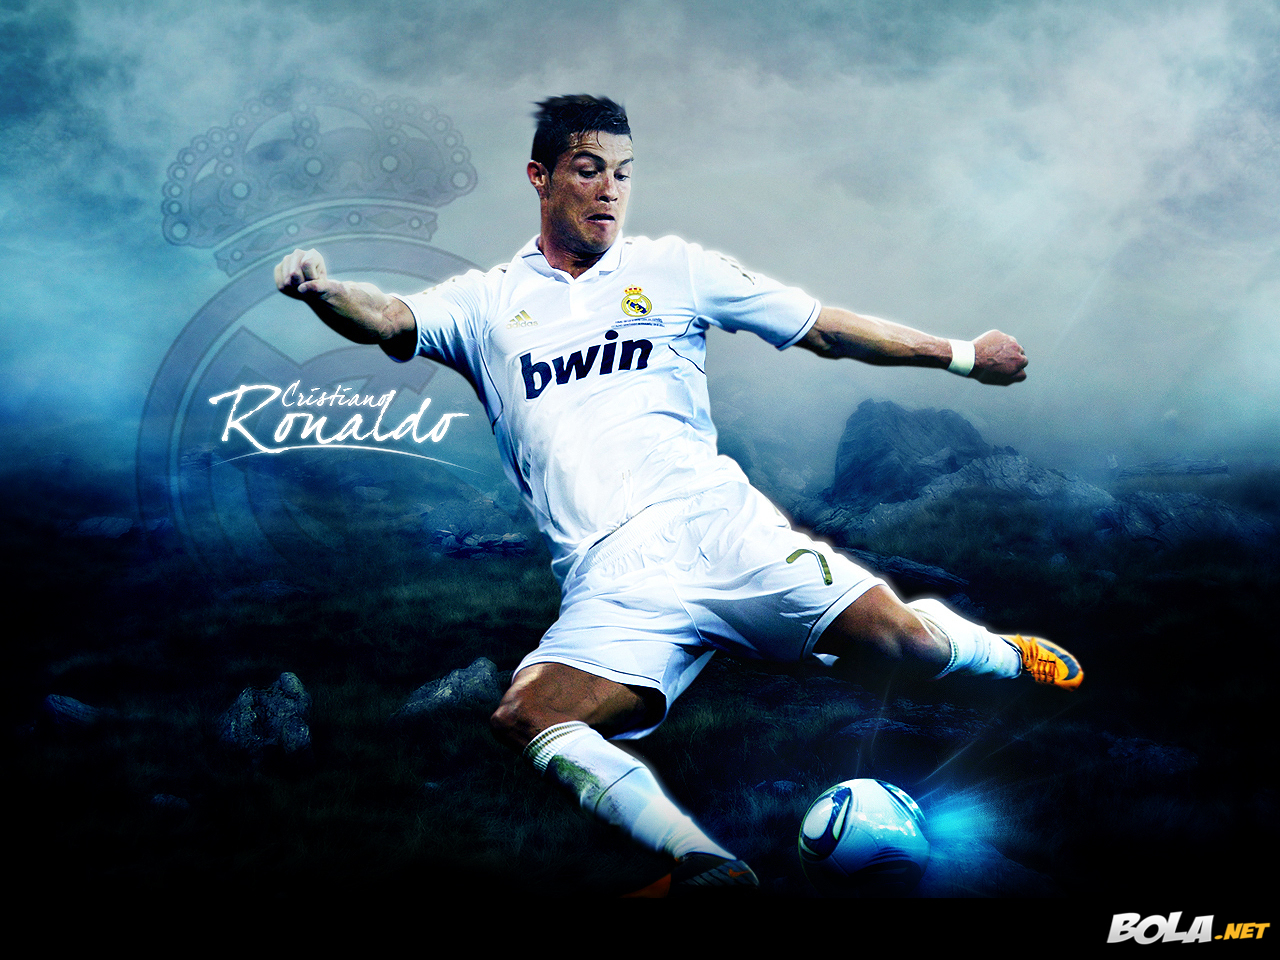 http://1.bp.blogspot.com/-ZggHN5J7jkY/T0JKOJ_ezoI/AAAAAAAADeU/-waZp8M1kdY/s1600/Cristiano+Ronaldo+2012+HD+Wallpaper-04.jpg